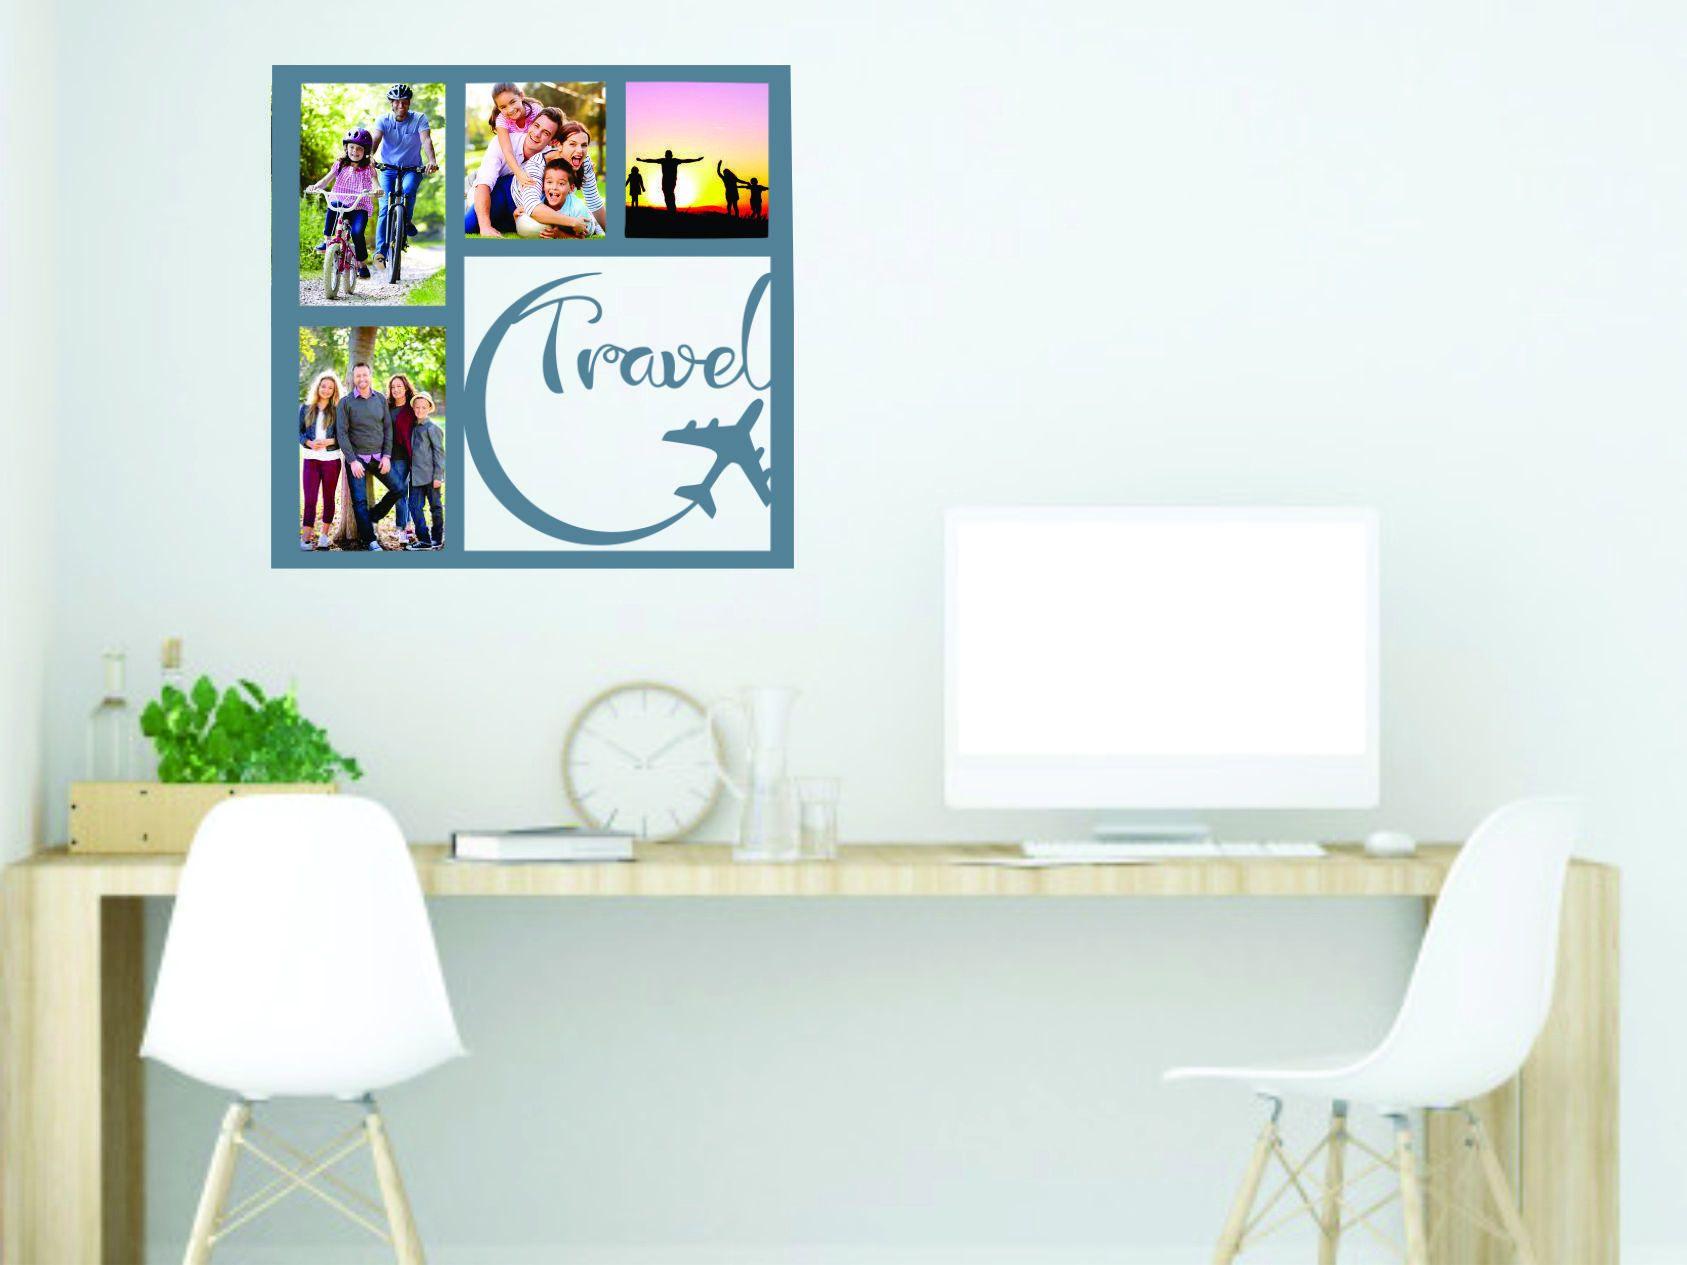 living travel.jpg Download free STL file Travel photo frame - Travel photo frame • 3D print object, zafirah99